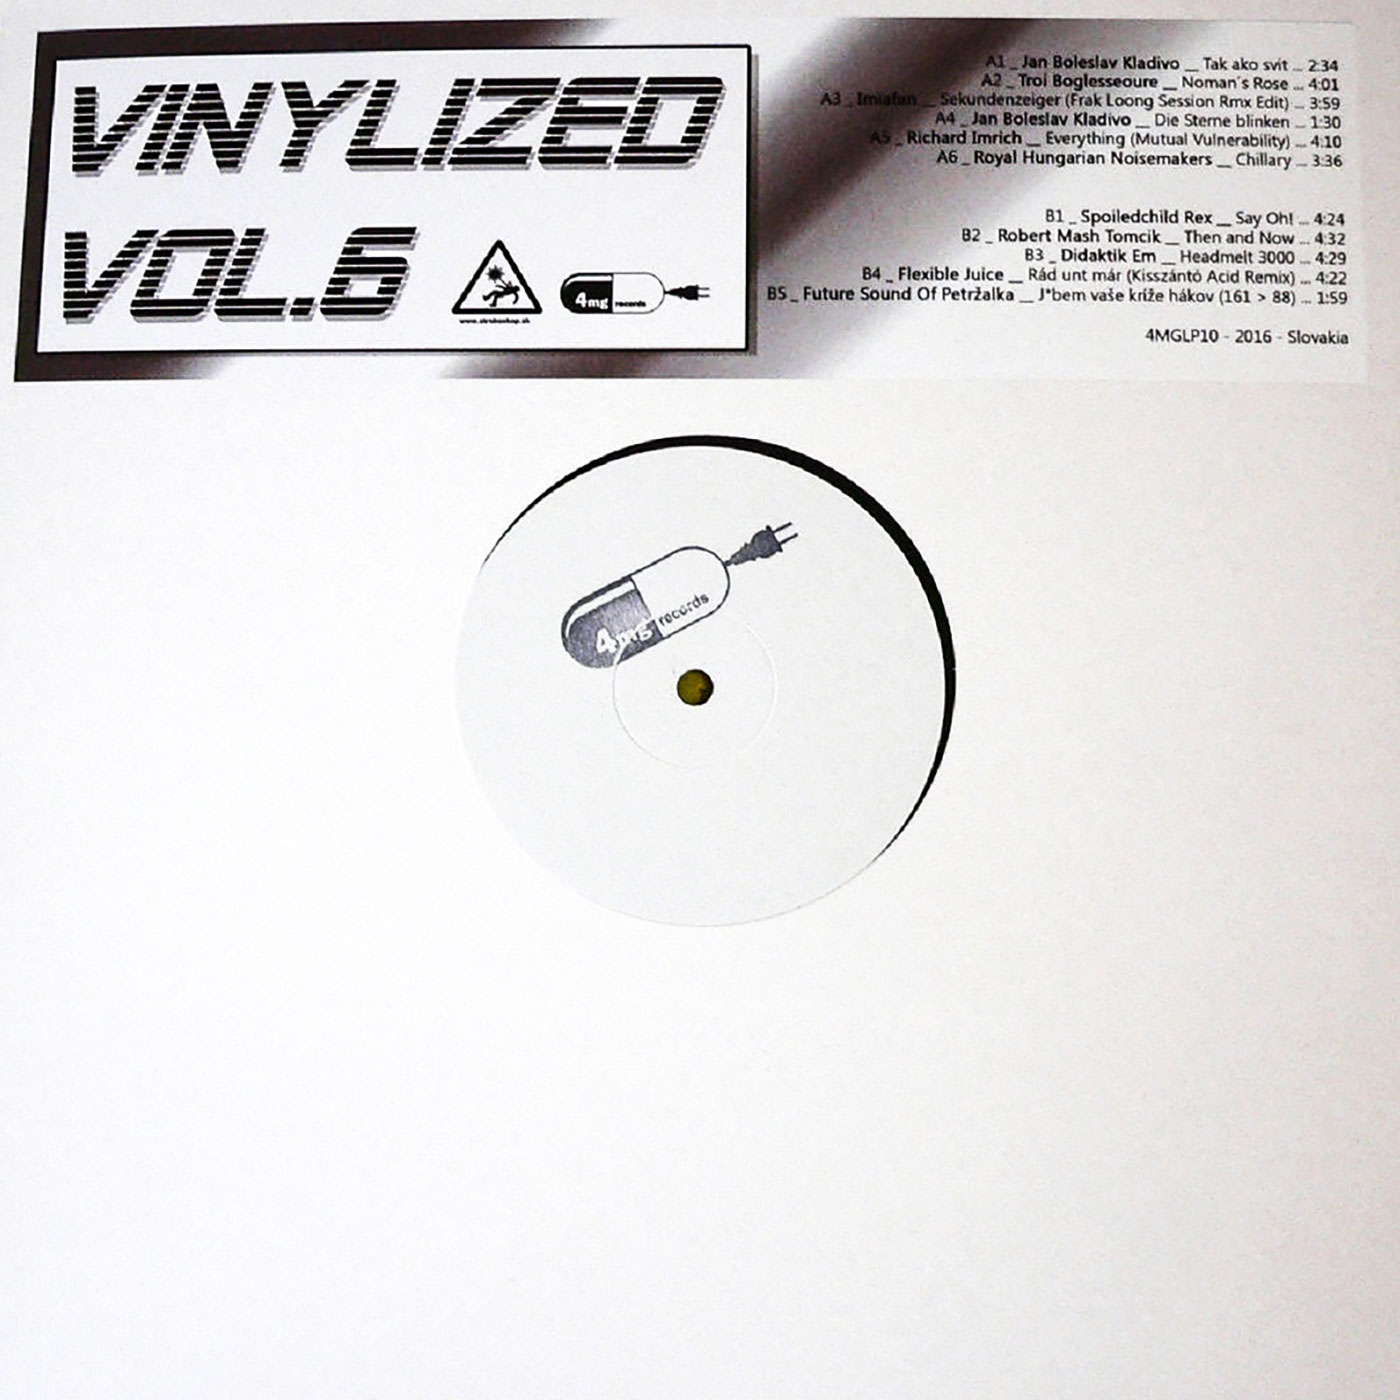 VA - Vinylized Vol.6 LP - 4mg Records